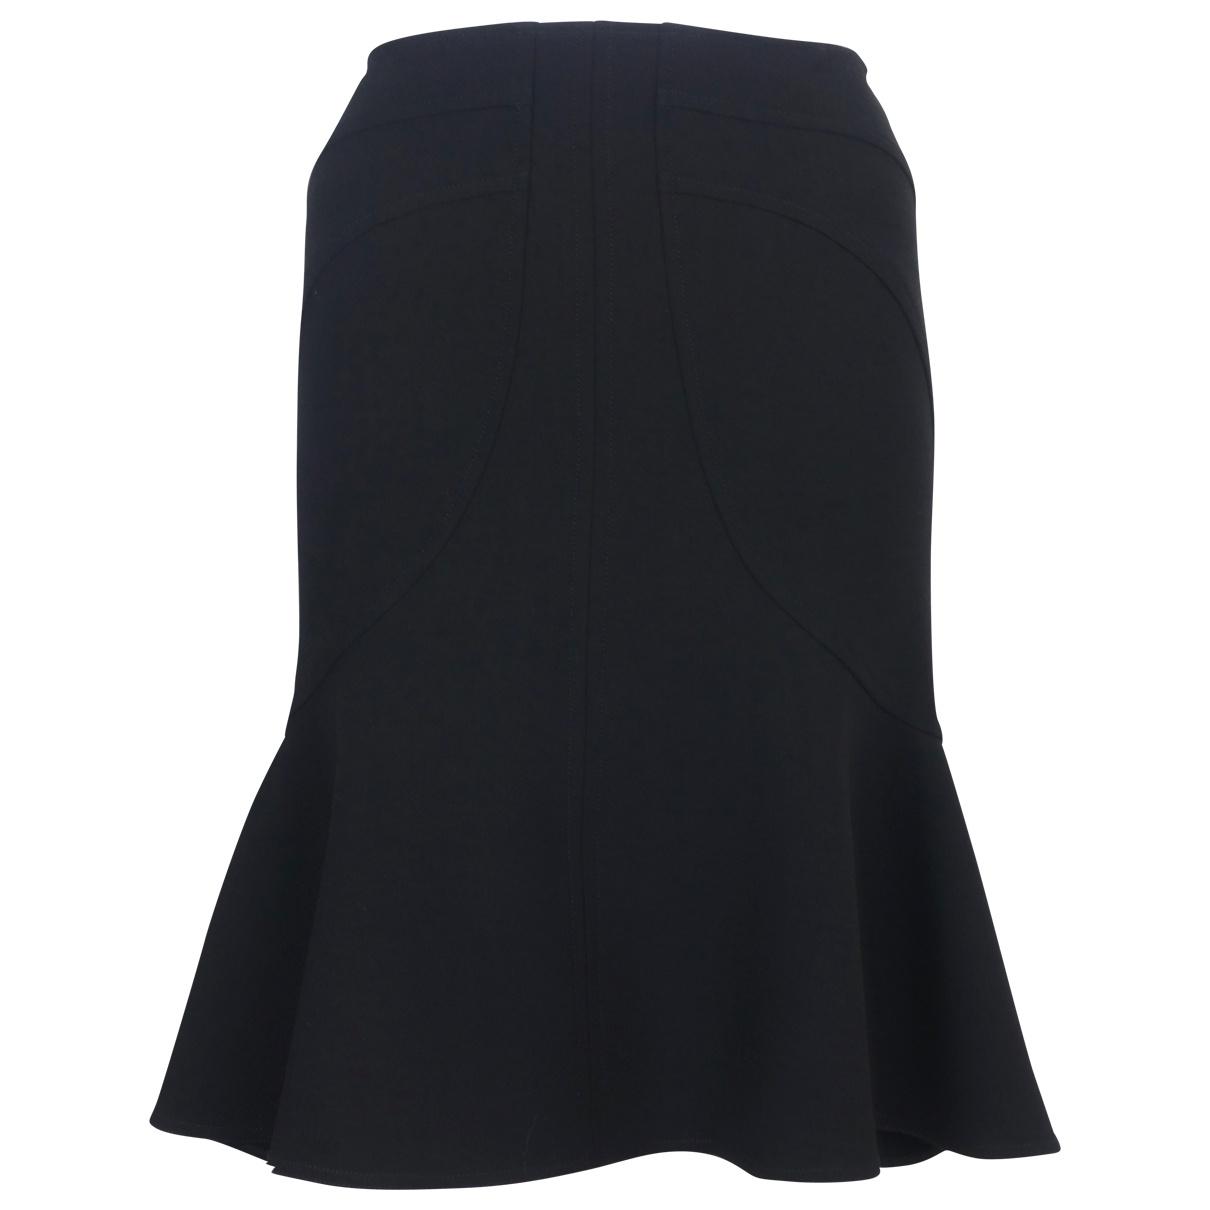 Versace \N Black Wool skirt for Women 38 FR